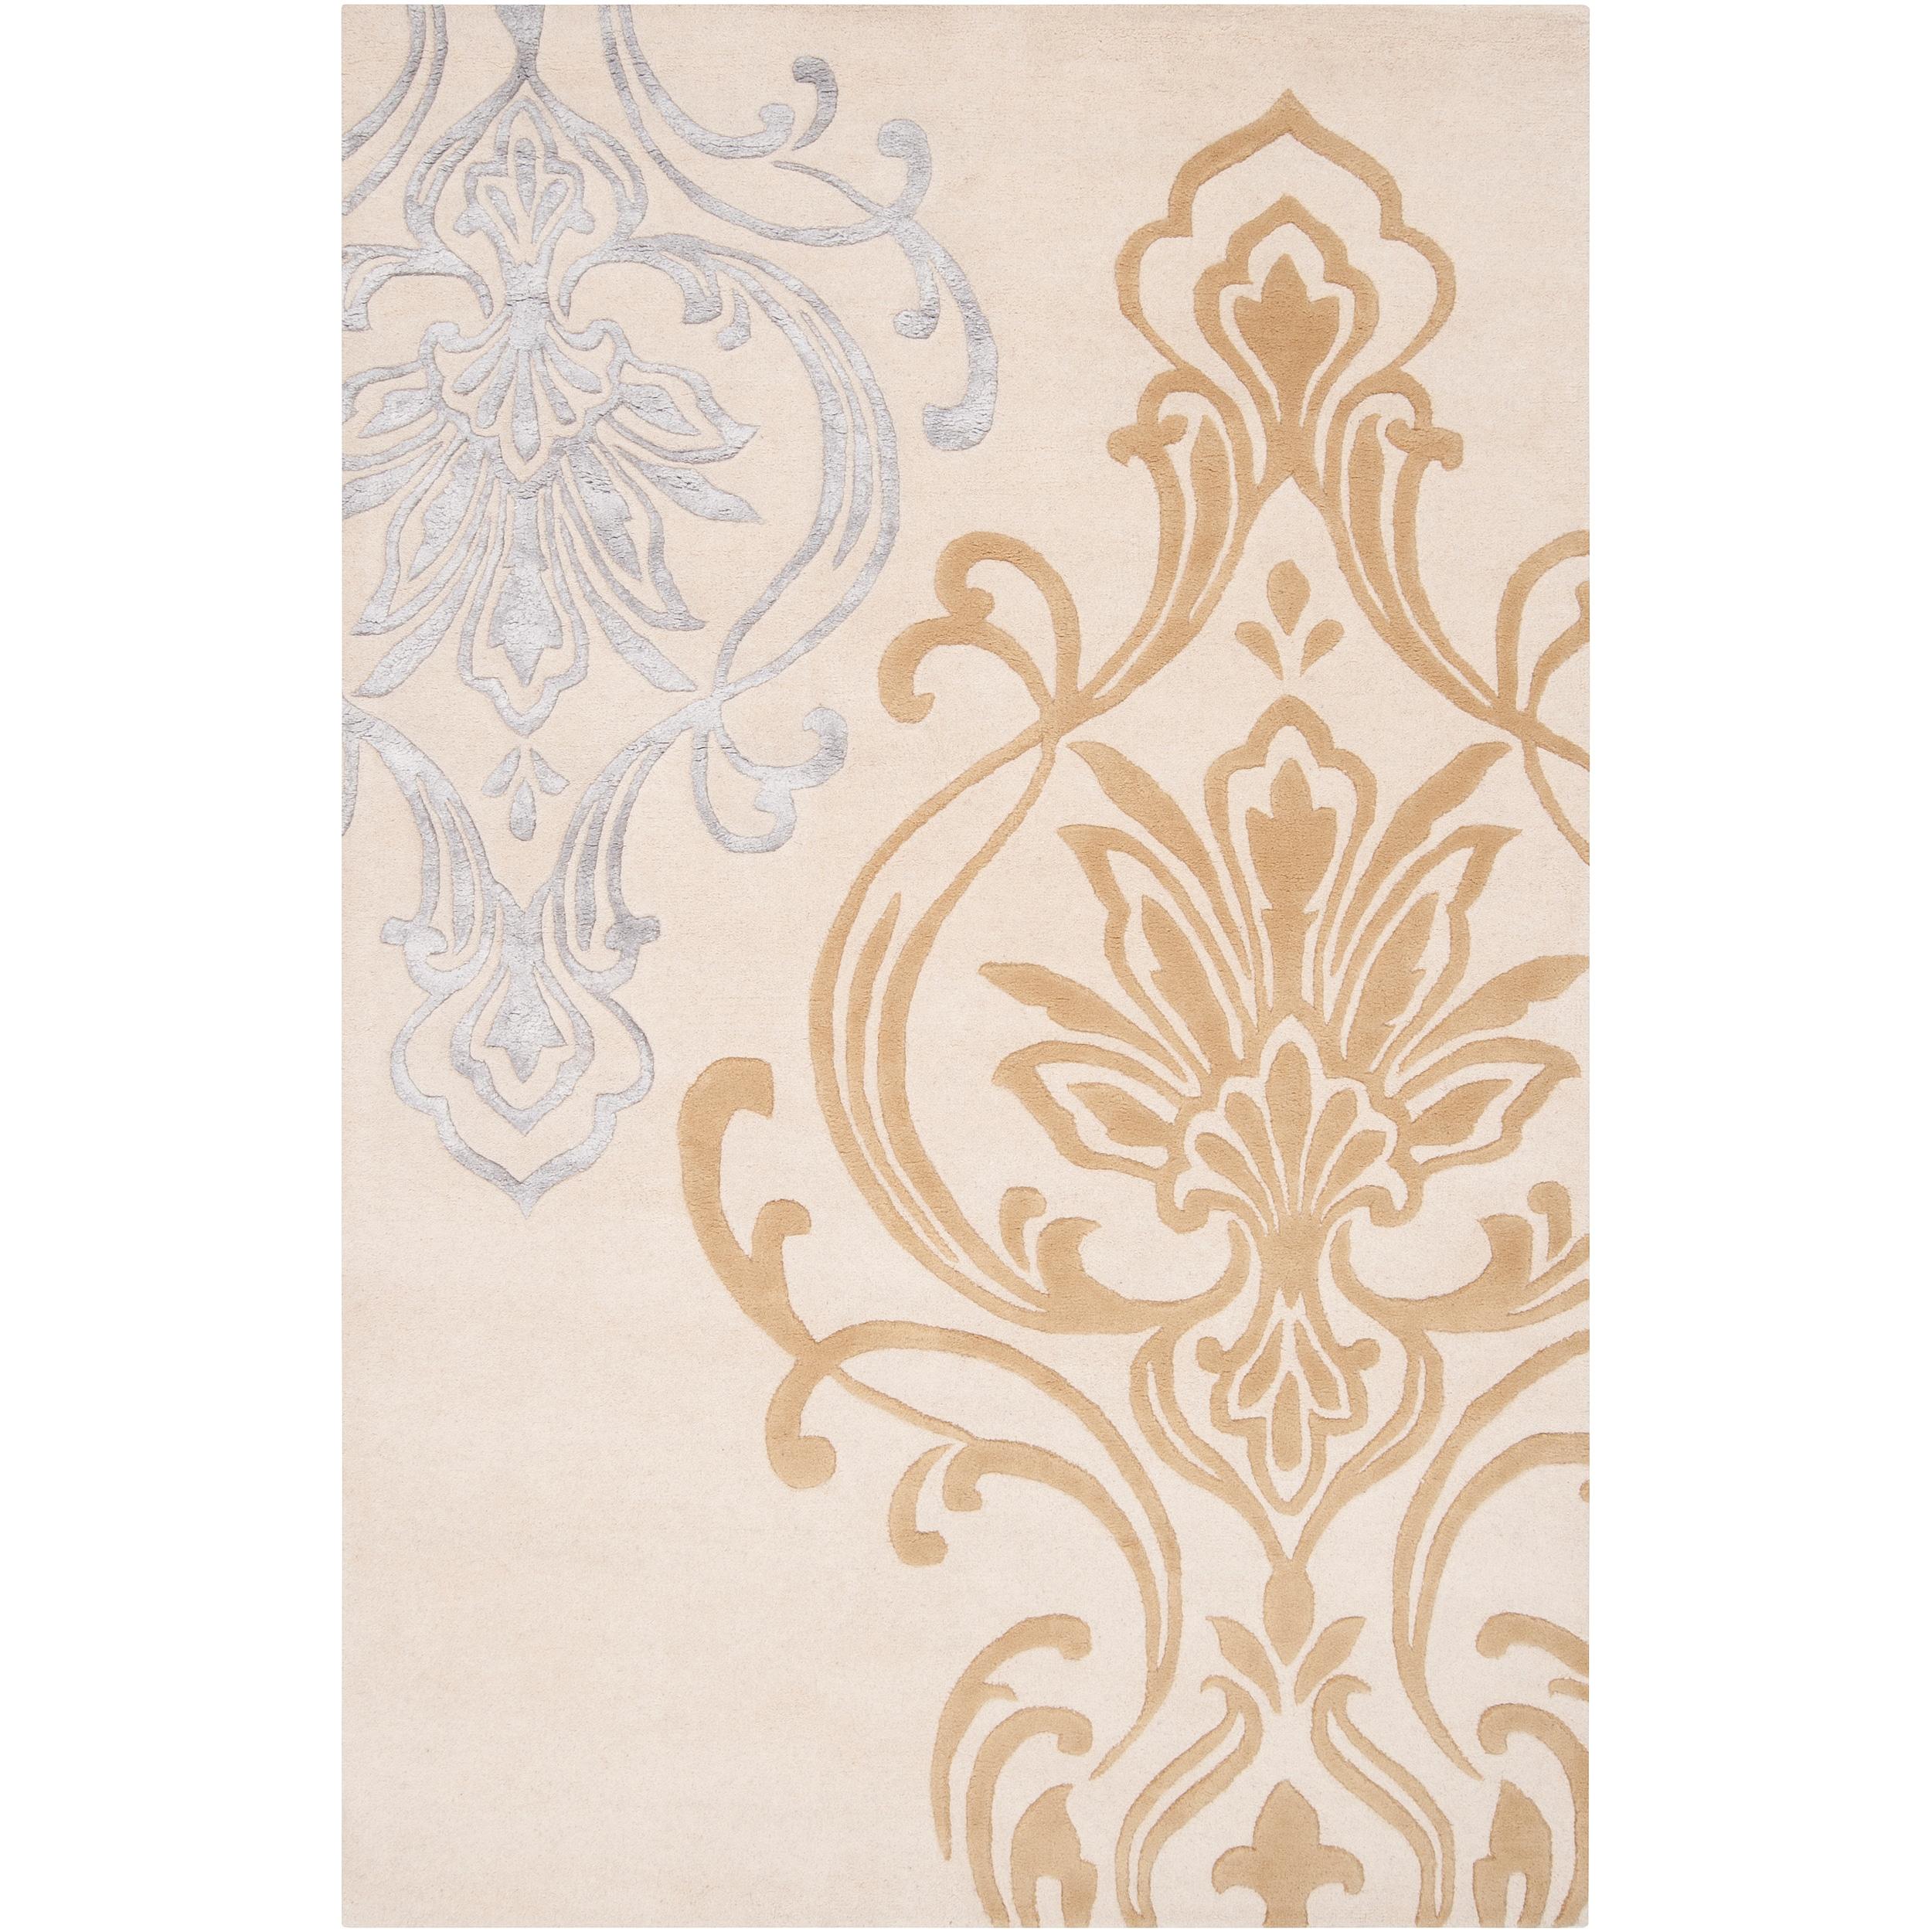 Hand-tufted Ivory Eurydice Damask Design Wool Area Rug (5' x 8')